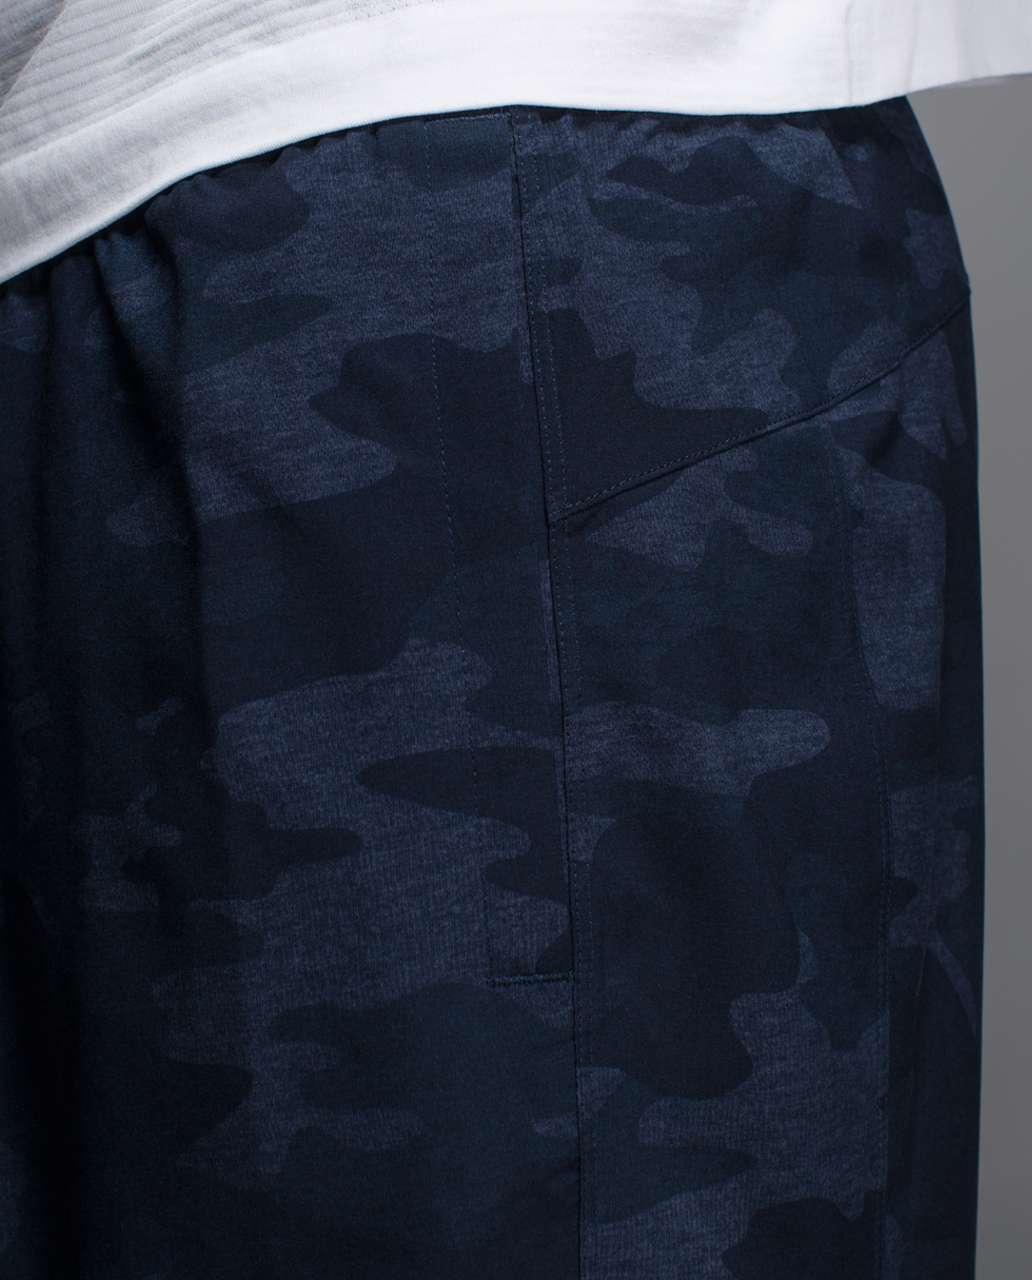 "Lululemon T.H.E. Short 9"" - Heathered Texture Lotus Camo Inkwell / Black"